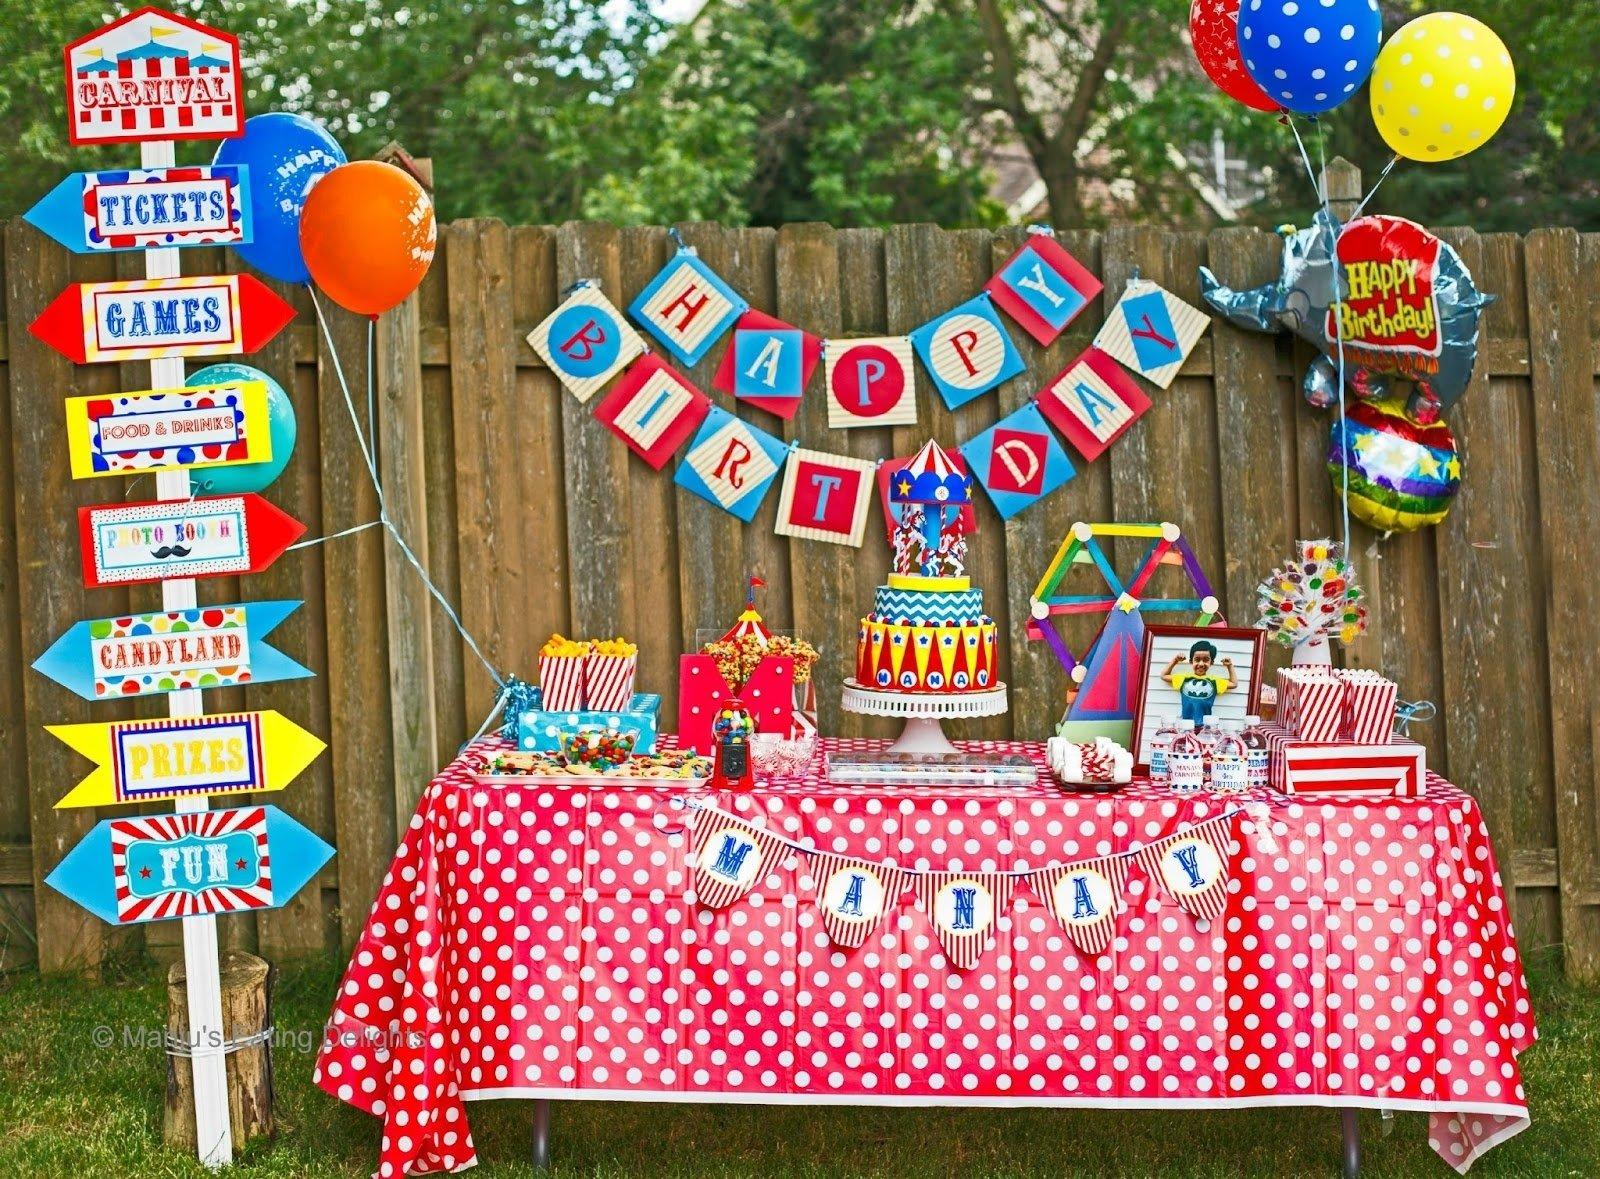 10 Fashionable Carnival Themed Birthday Party Ideas manjus eating delights carnival themed birthday manav turns 4 2021